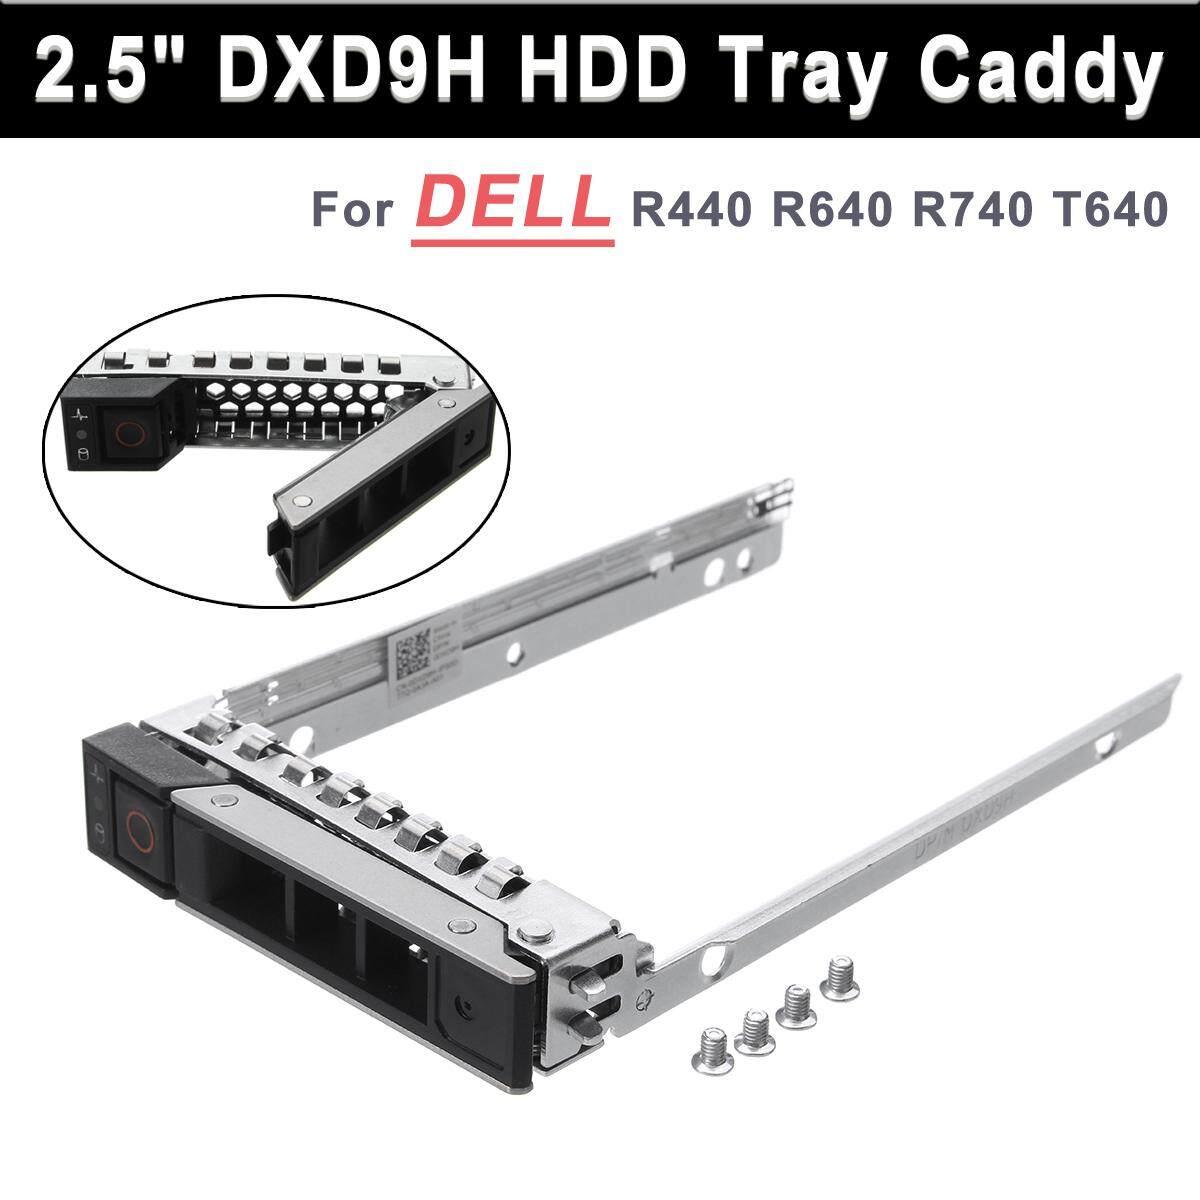 DELL DXD9H EMC SERVER R440 R640 R740 R740xd R940 2 5